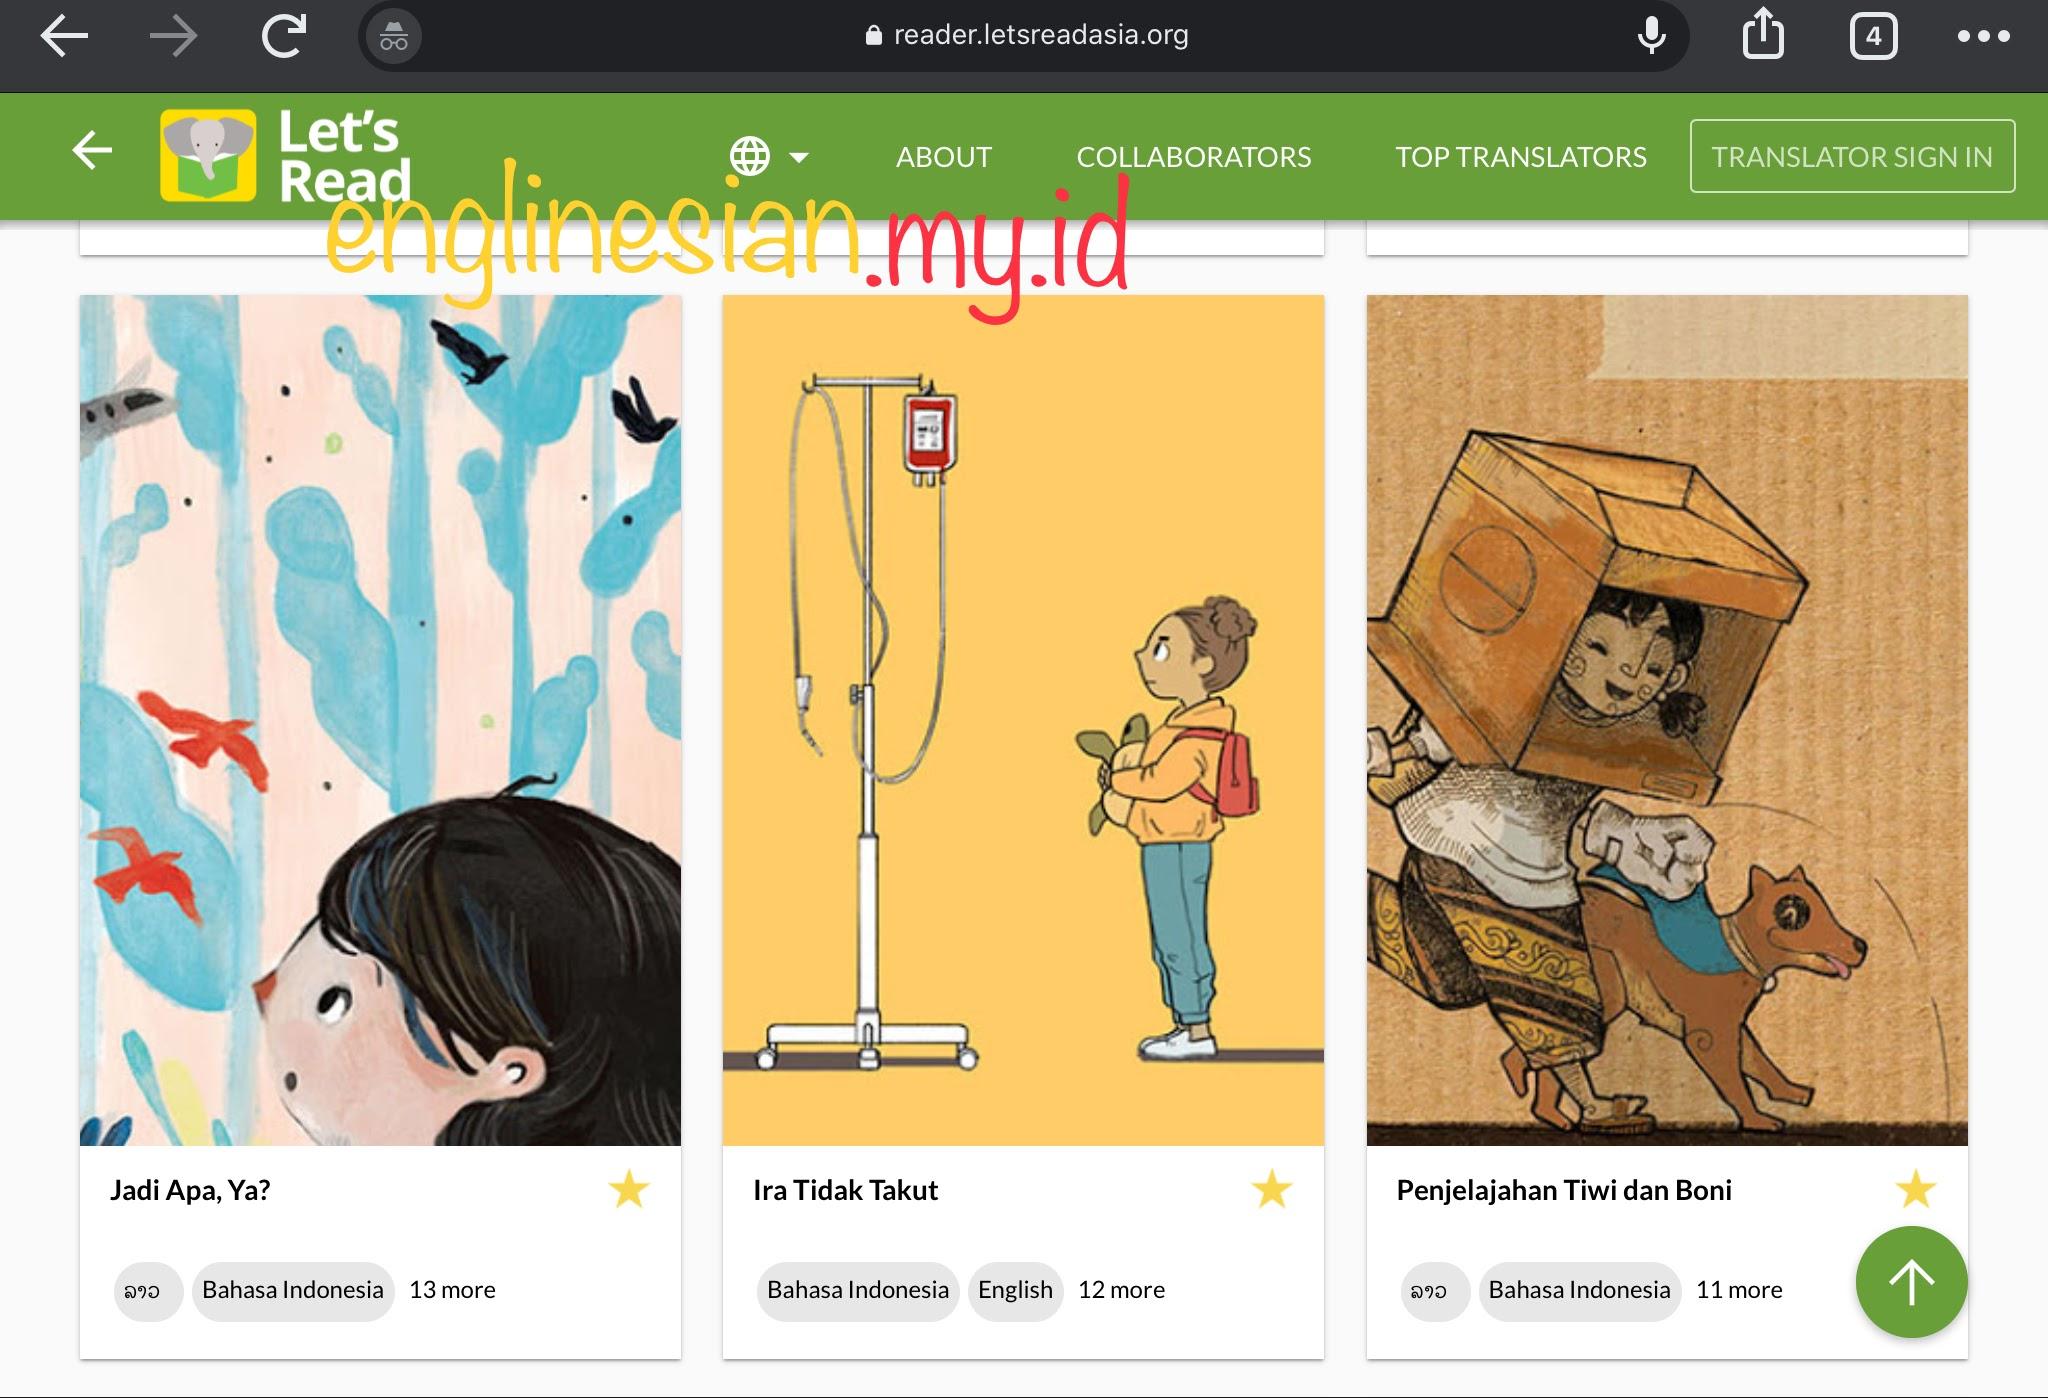 Englinesian: Let's Read Platform Cerita Bergambar